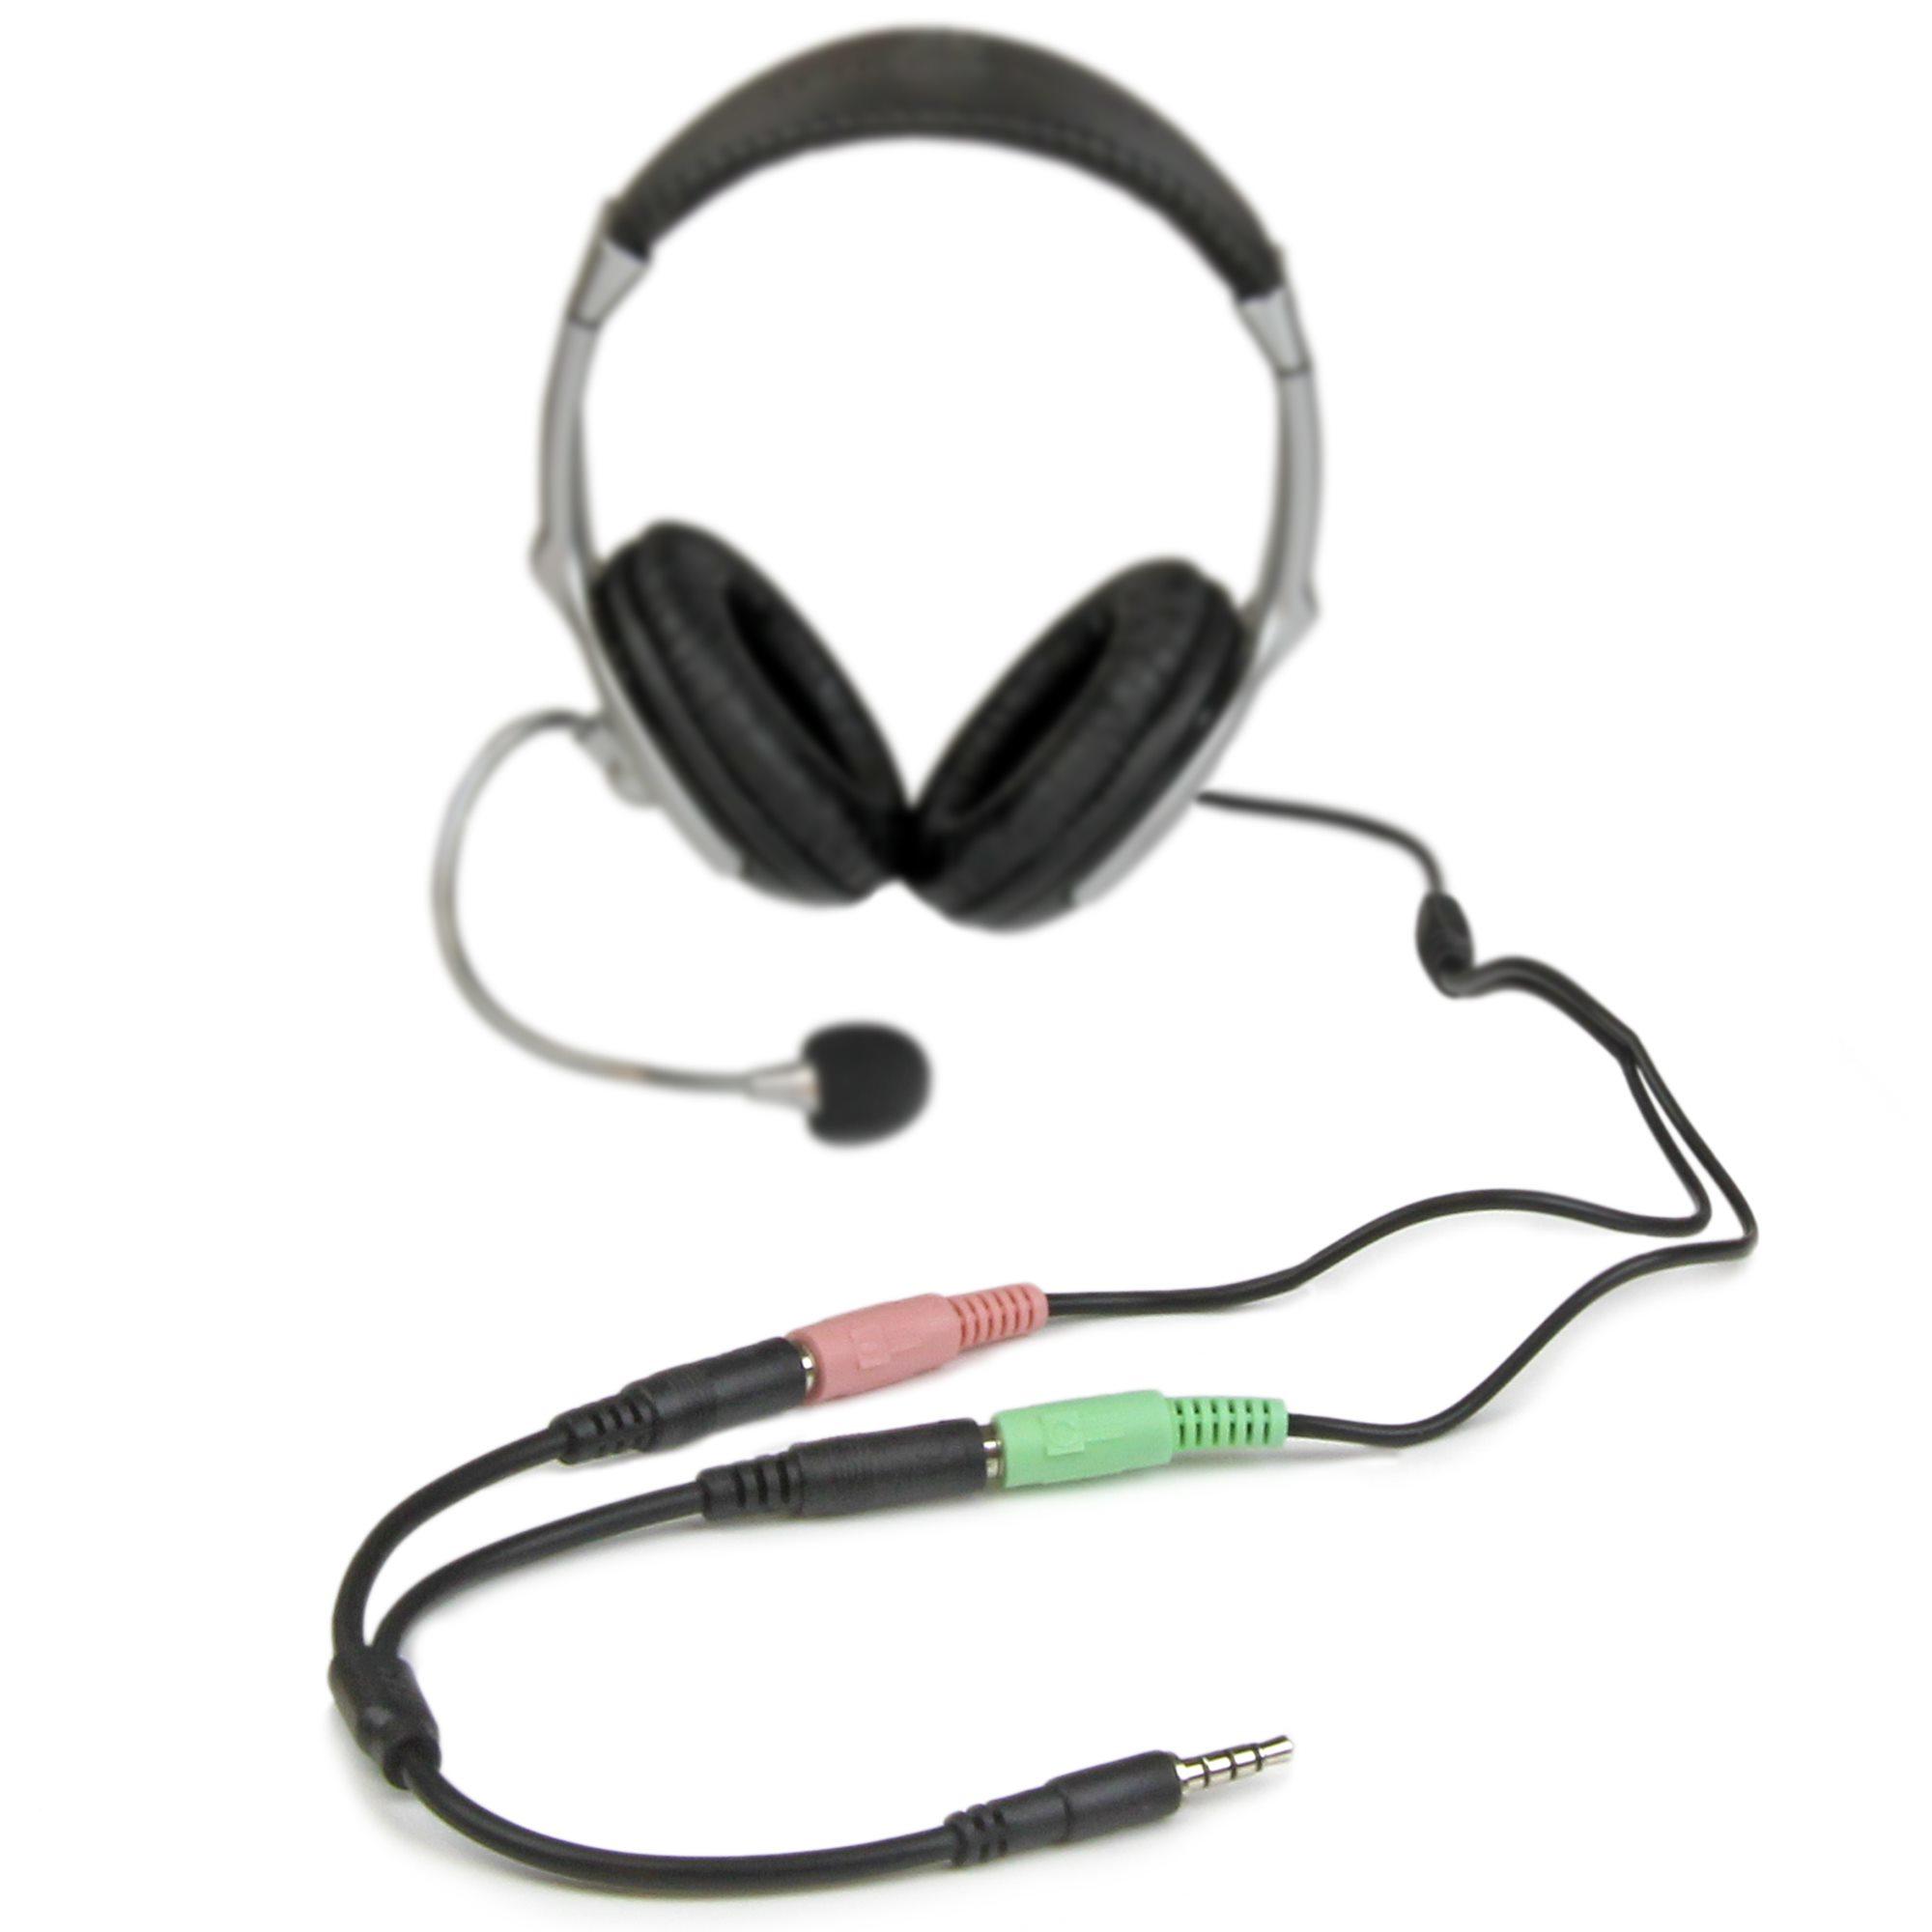 Audiokabels : Headset splitter 3,5 mm naar 2 x 3,5 mm F (4-pin)